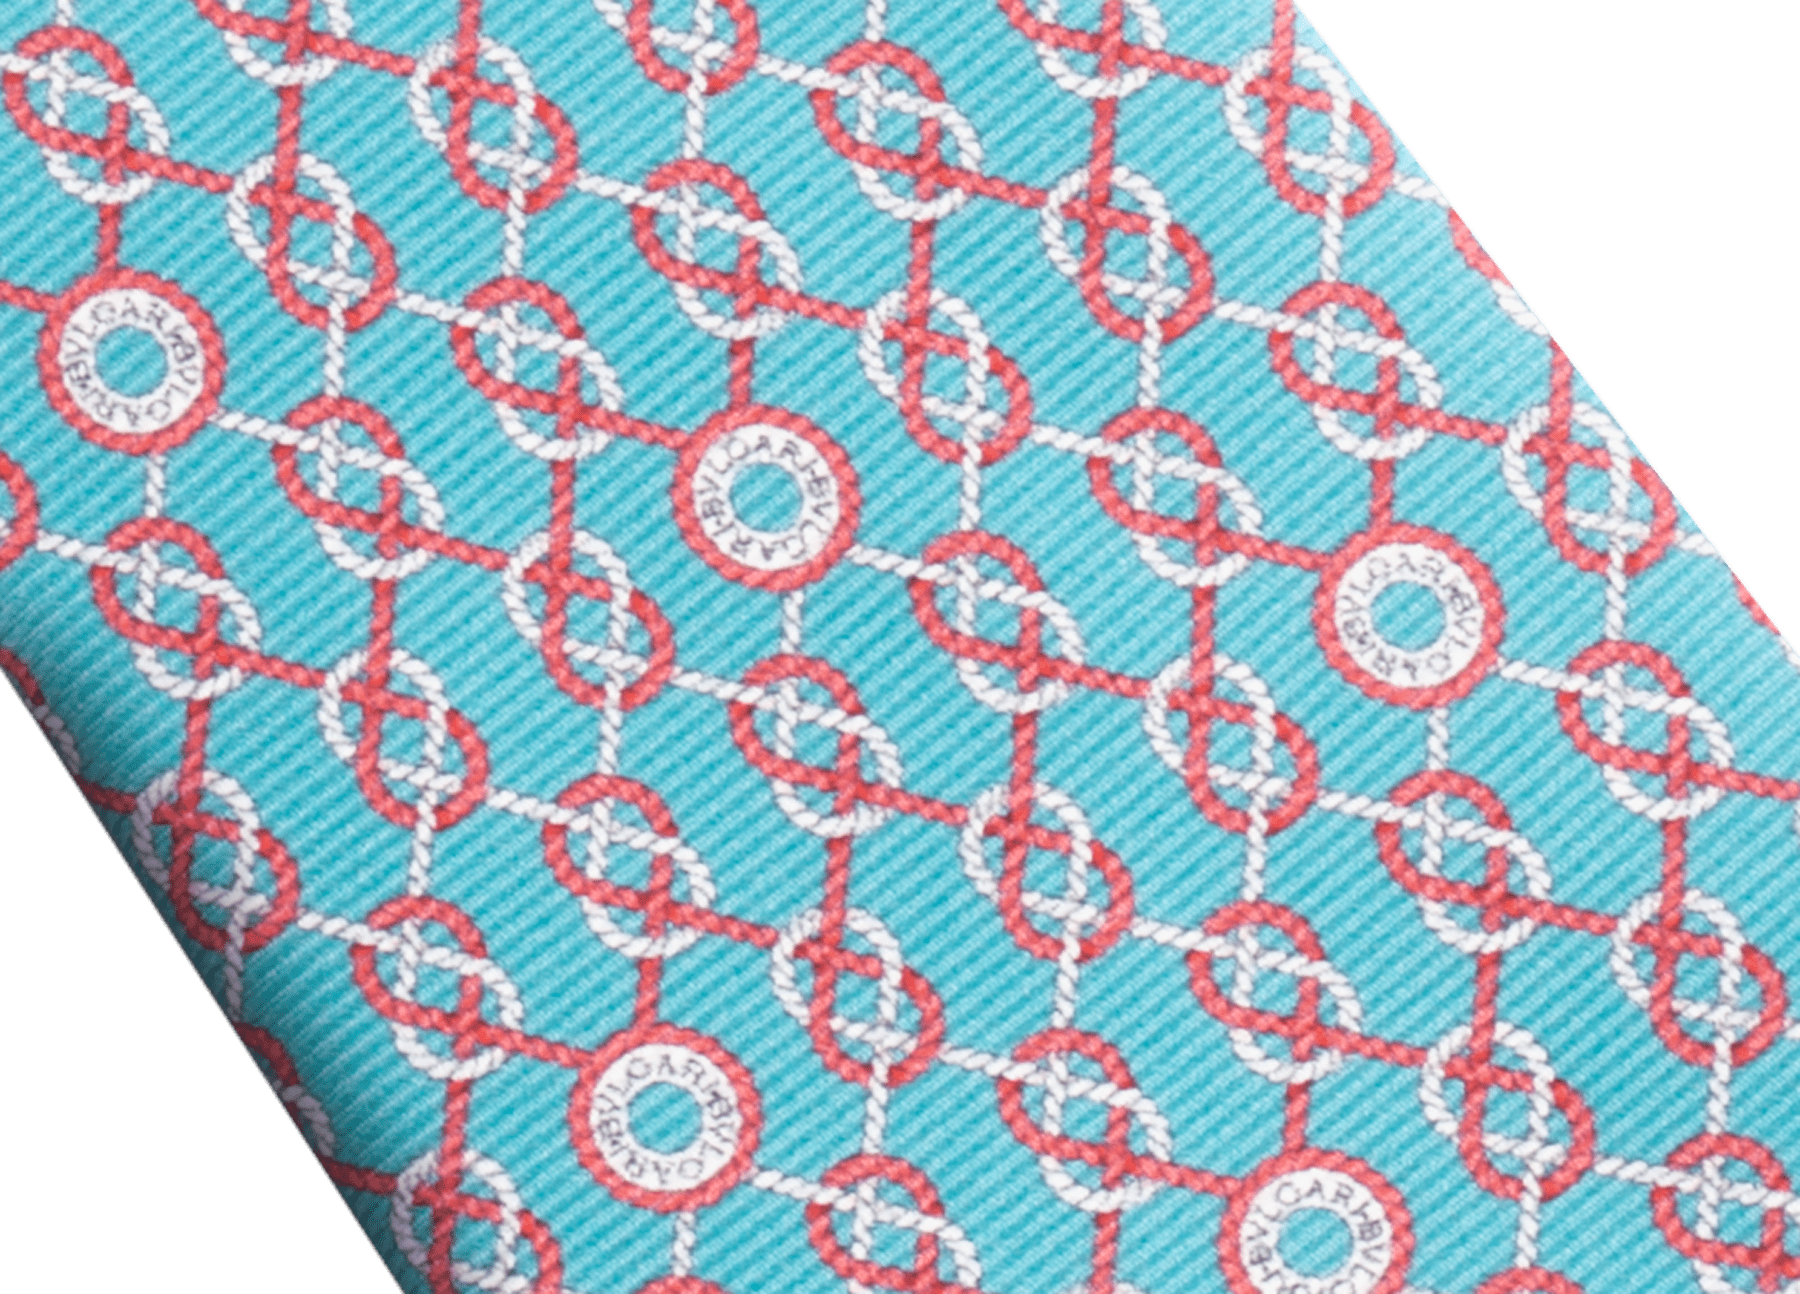 Arctic Jade Sailor Logo pattern seven-fold tie in fine saglione printed silk. 244198 image 2